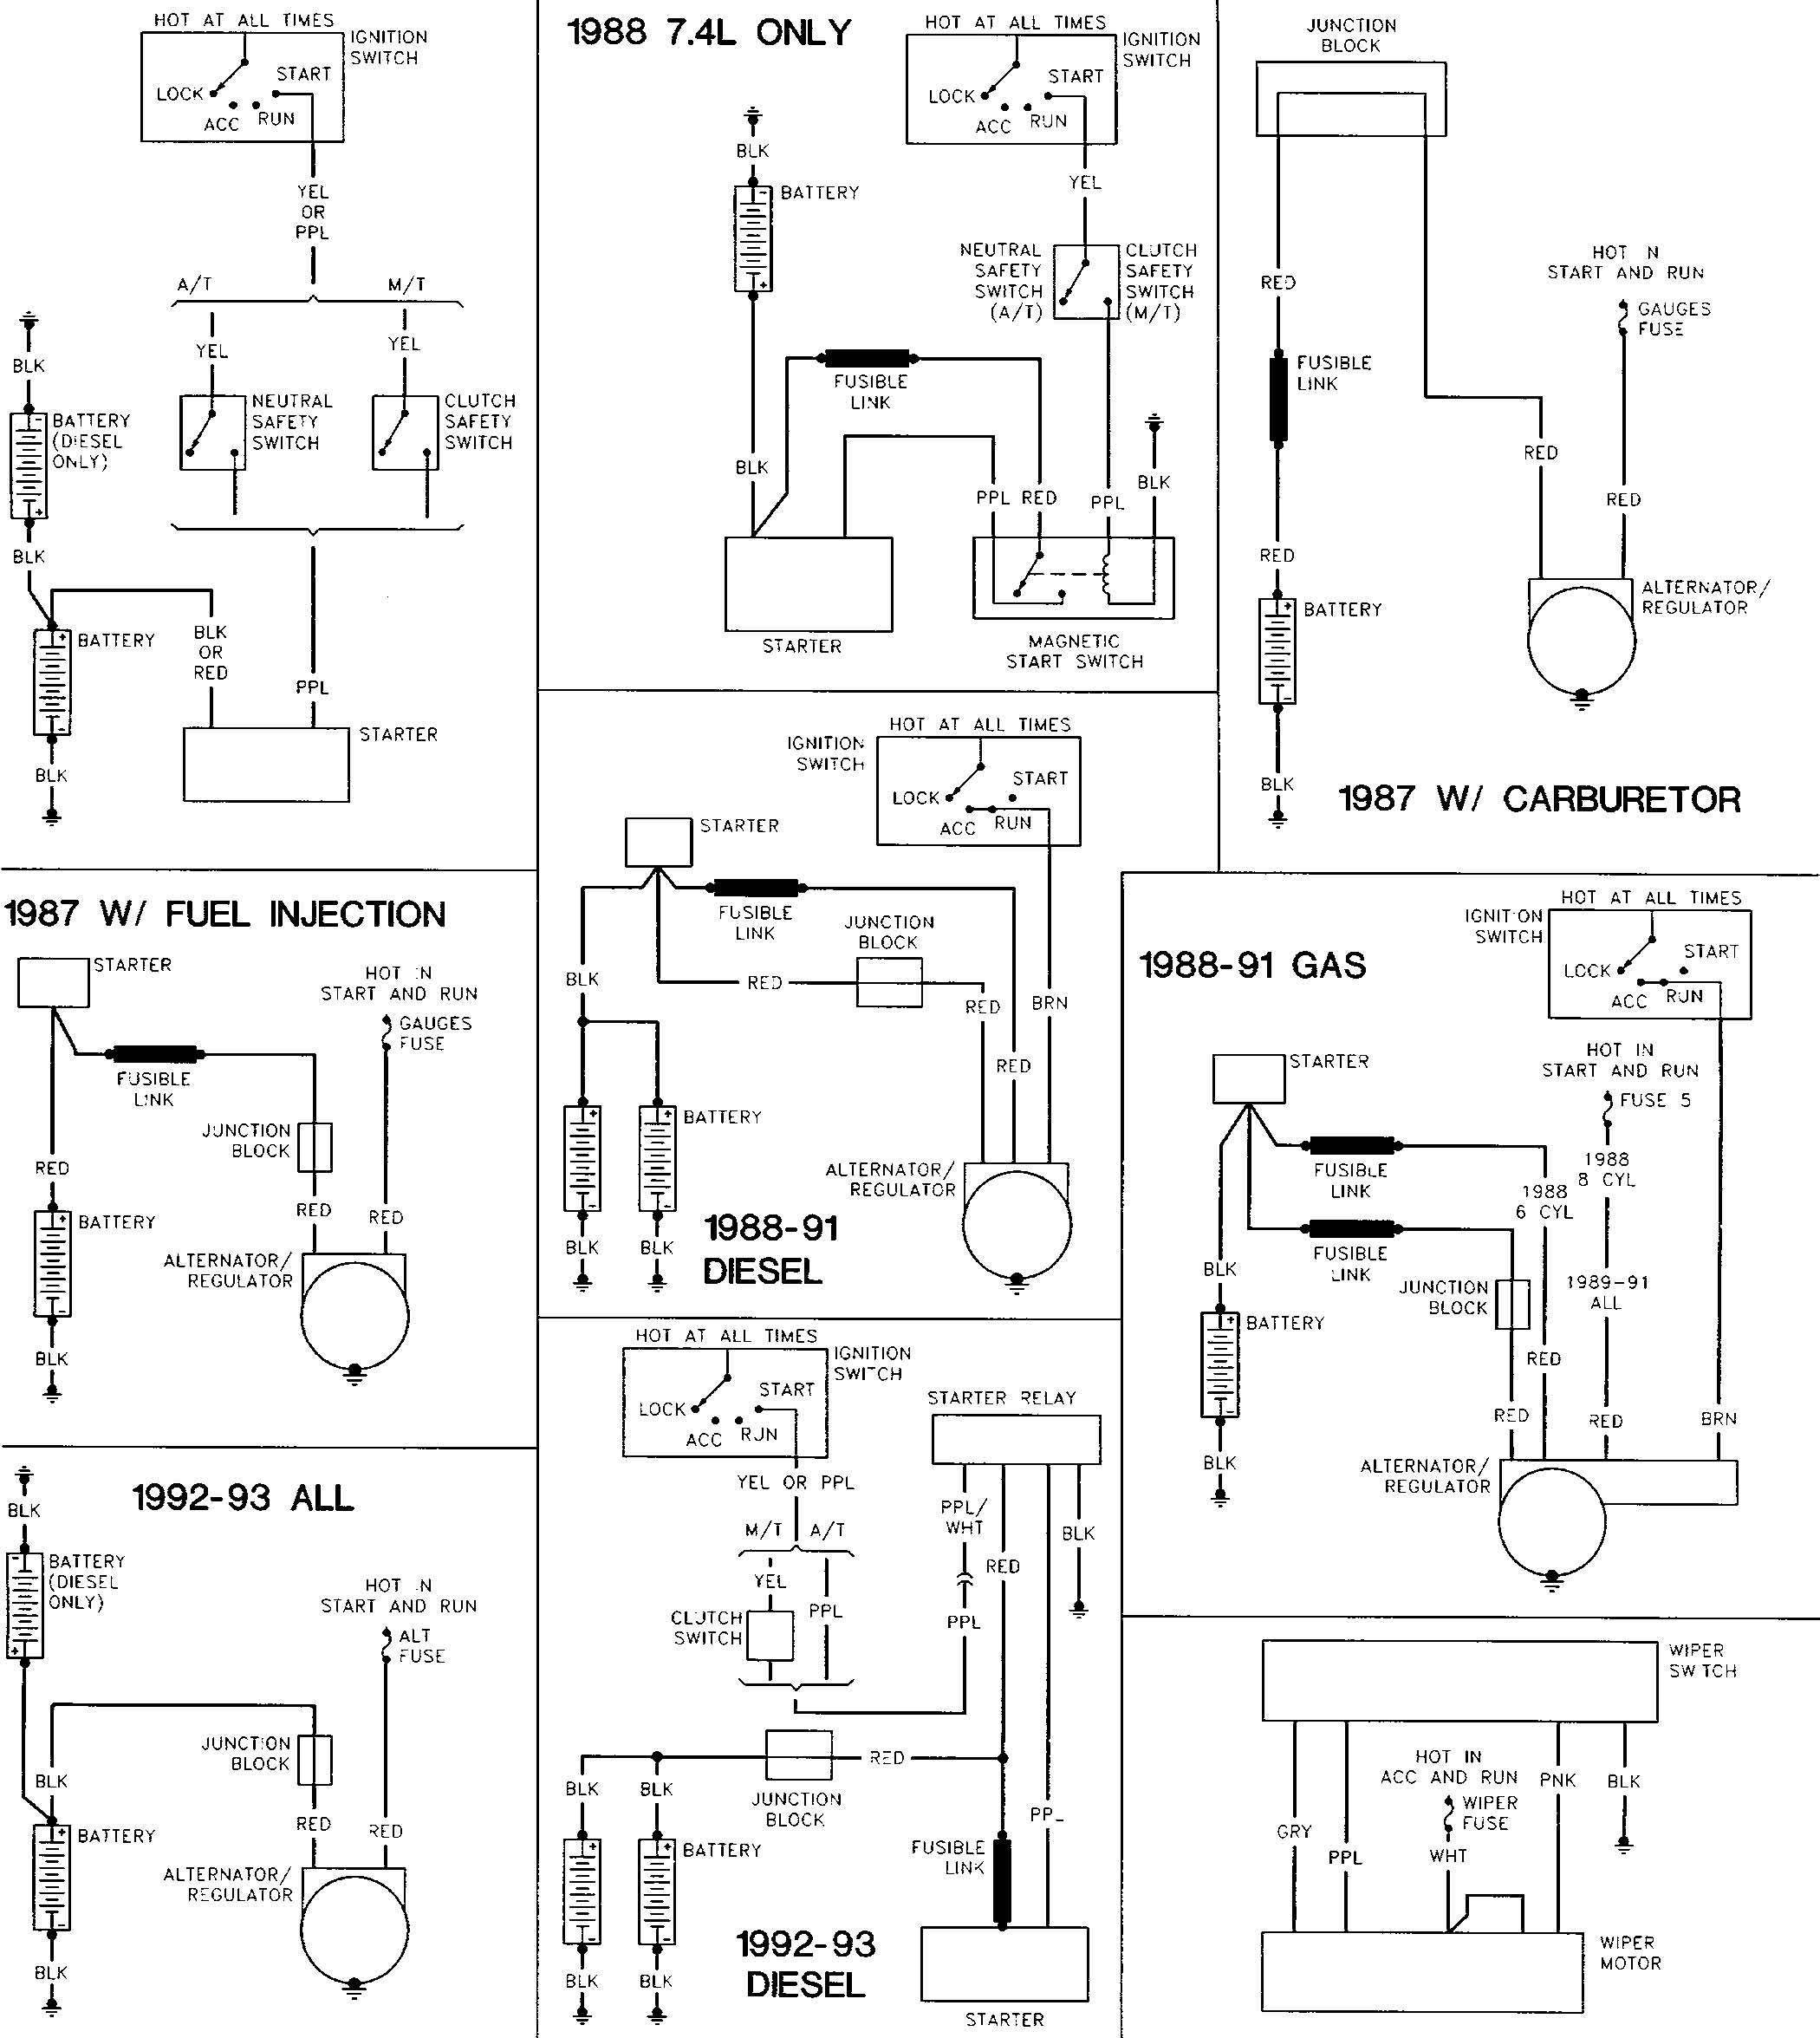 tiffin allegro bus wiring diagram